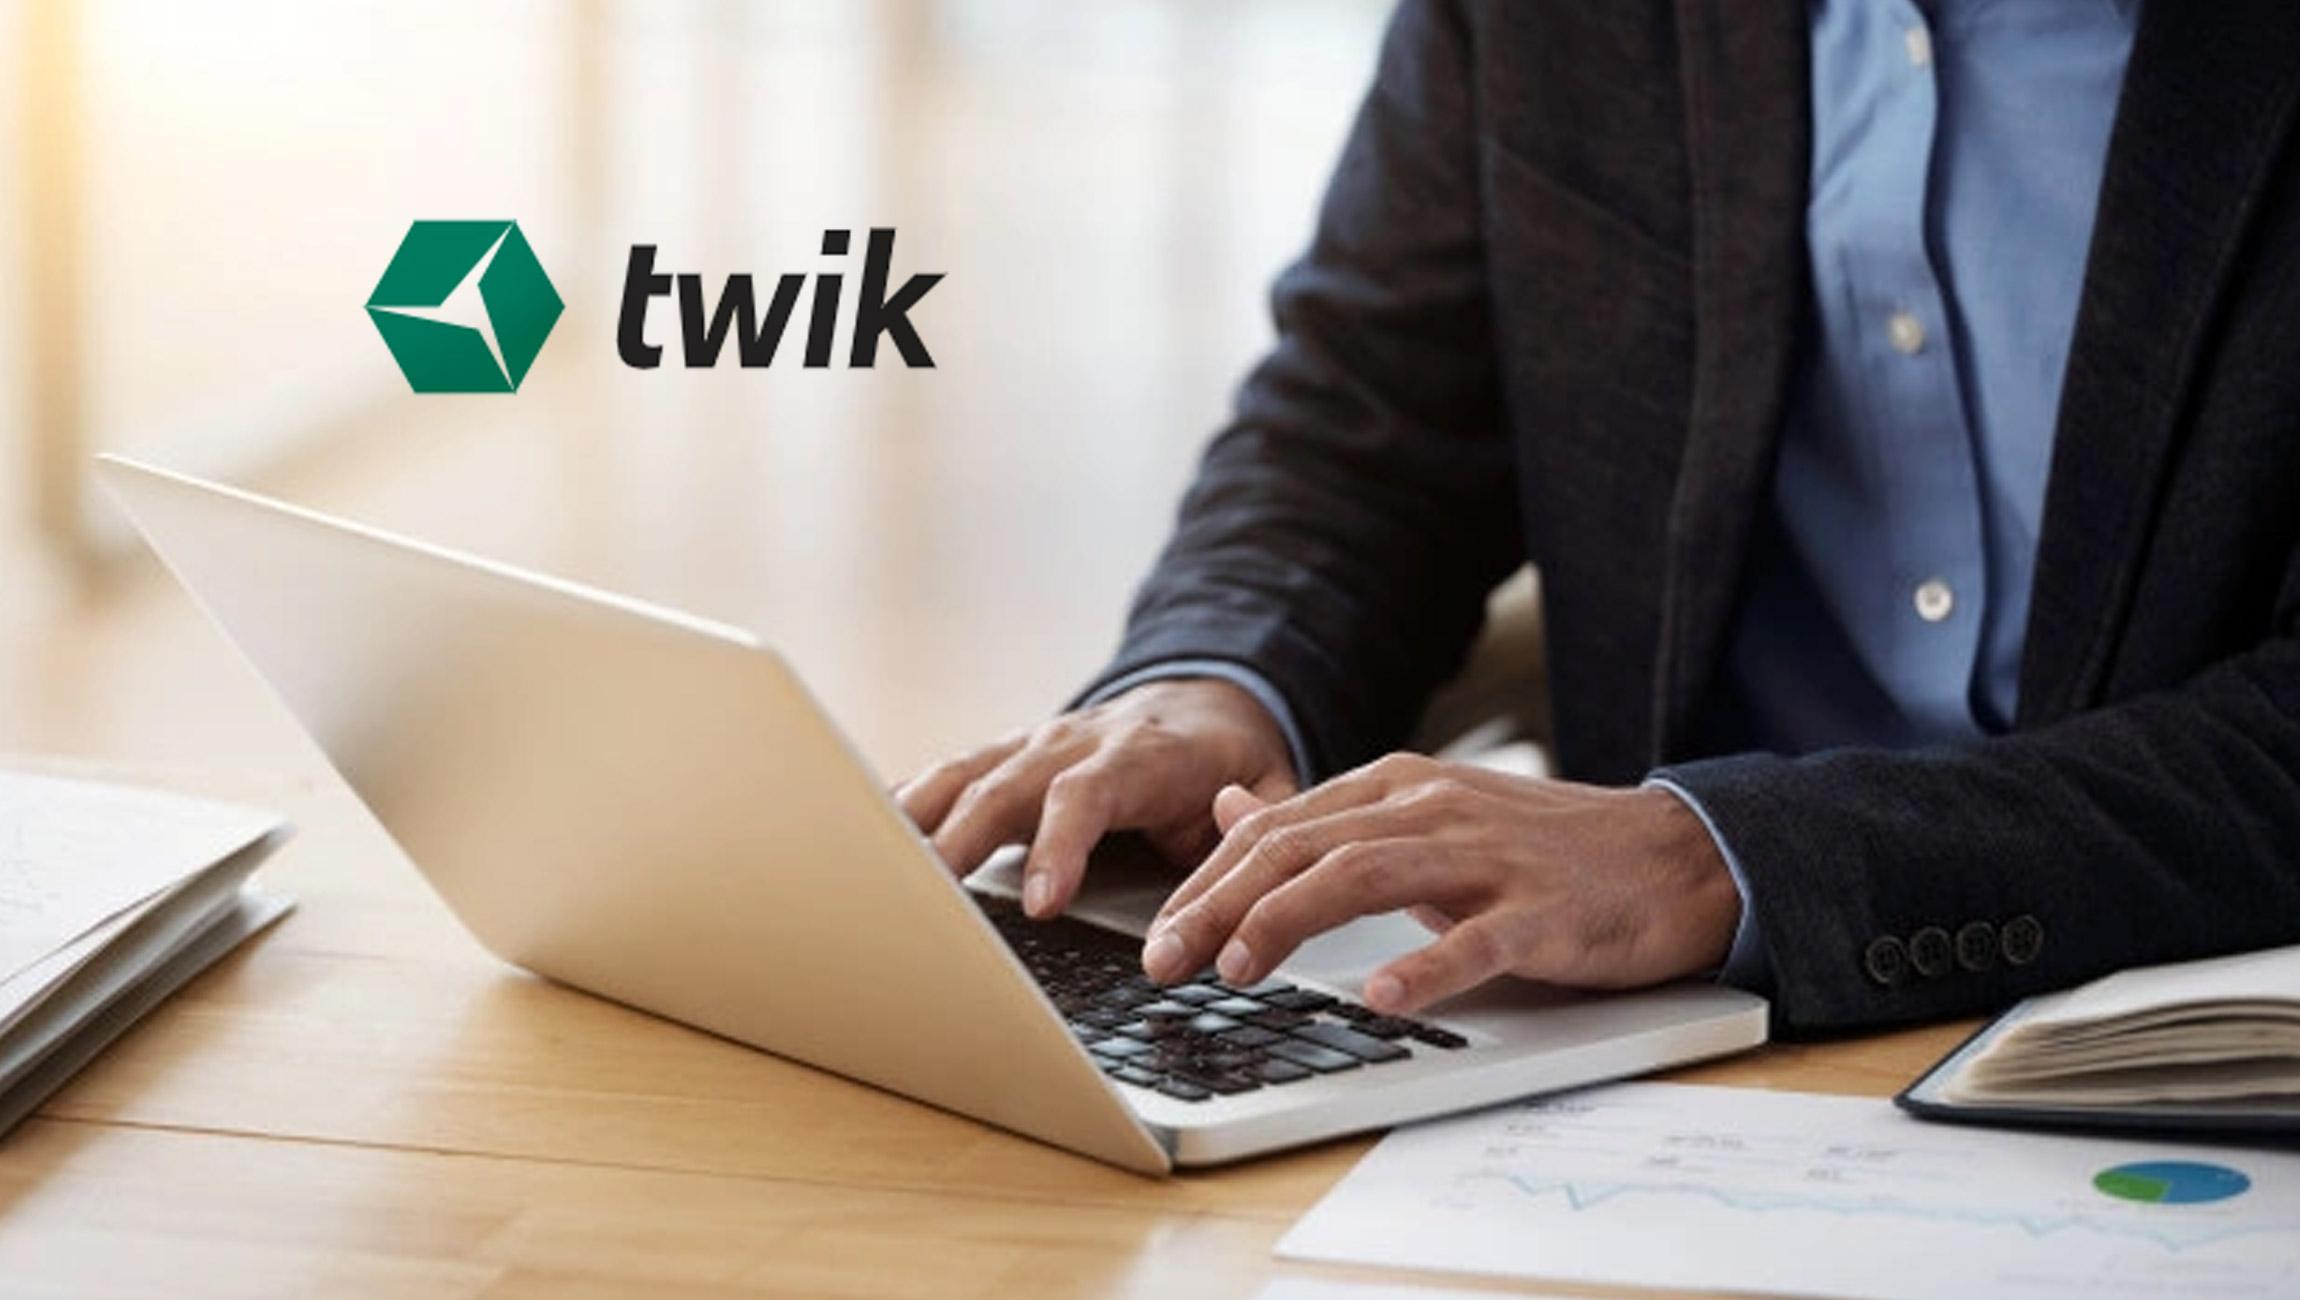 Twik - Automated Personalization Platform files for Patent